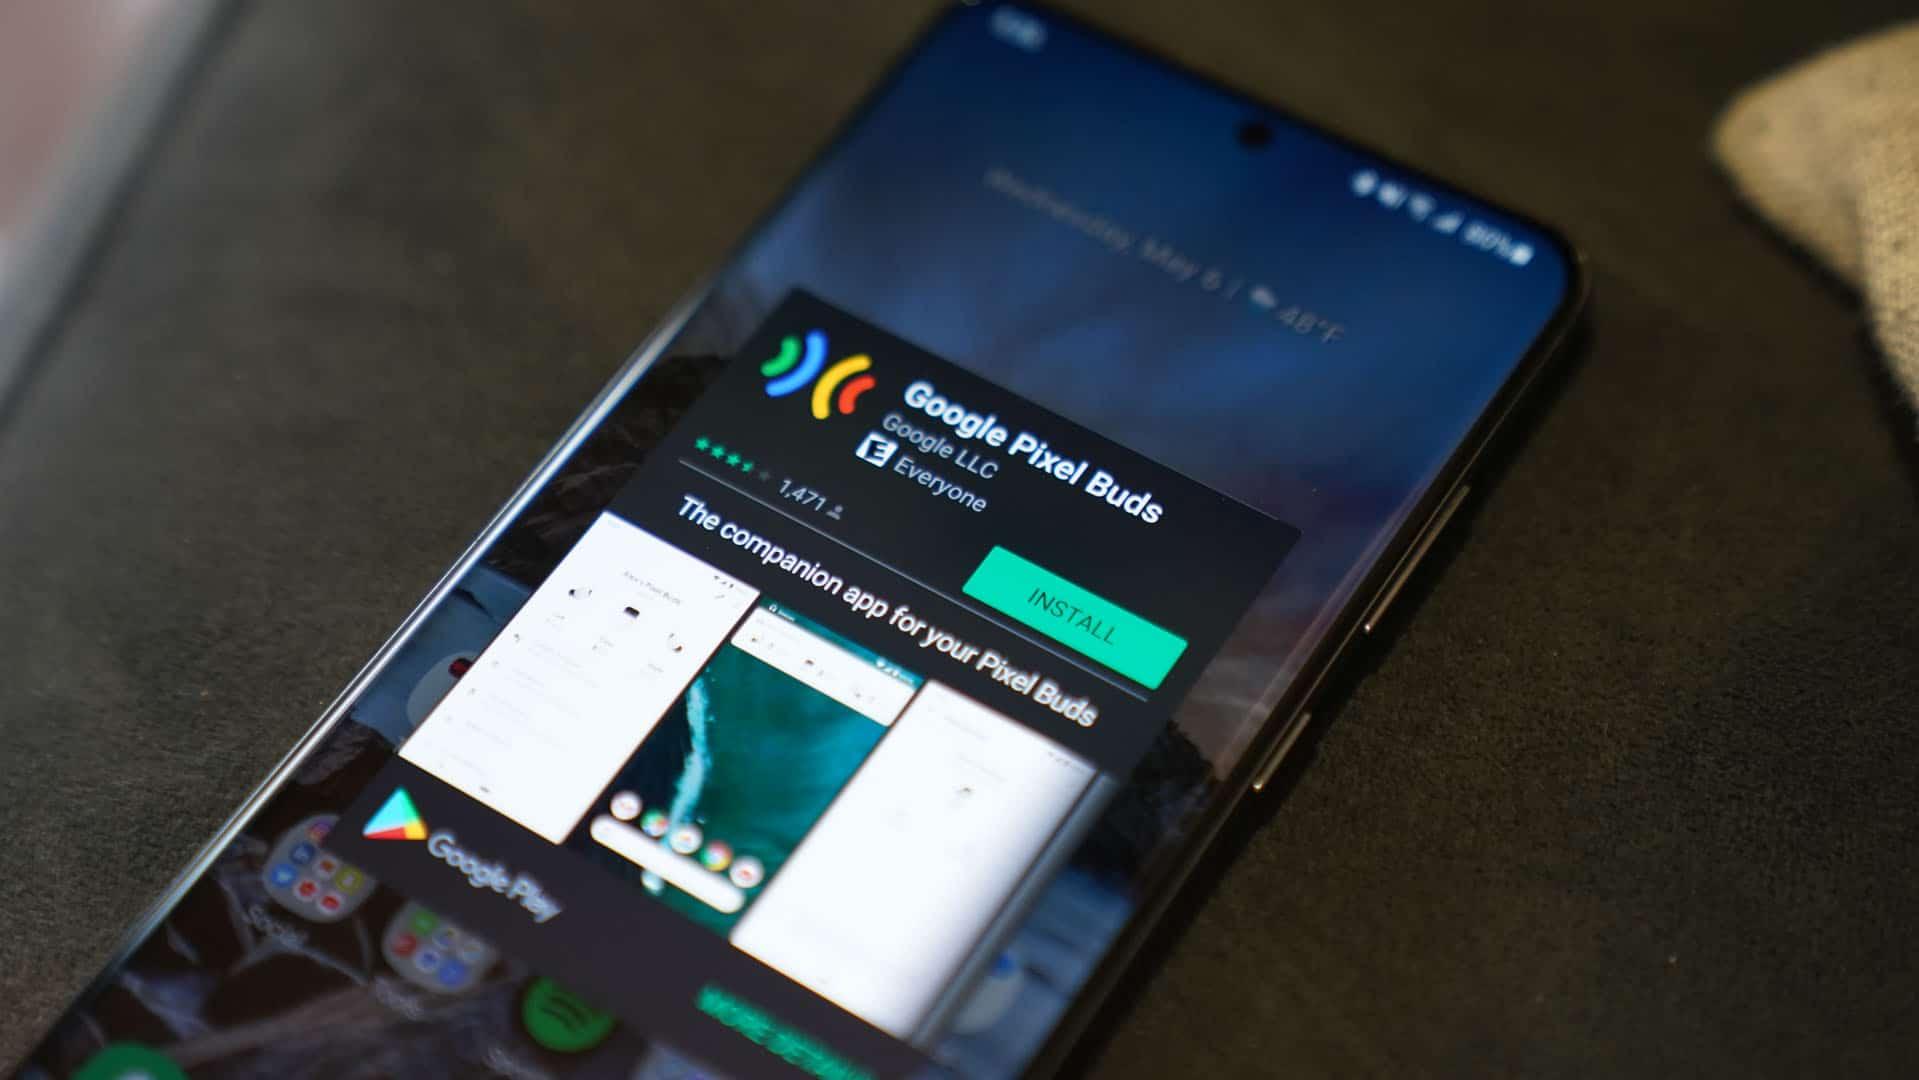 Pixel Buds Play Store App